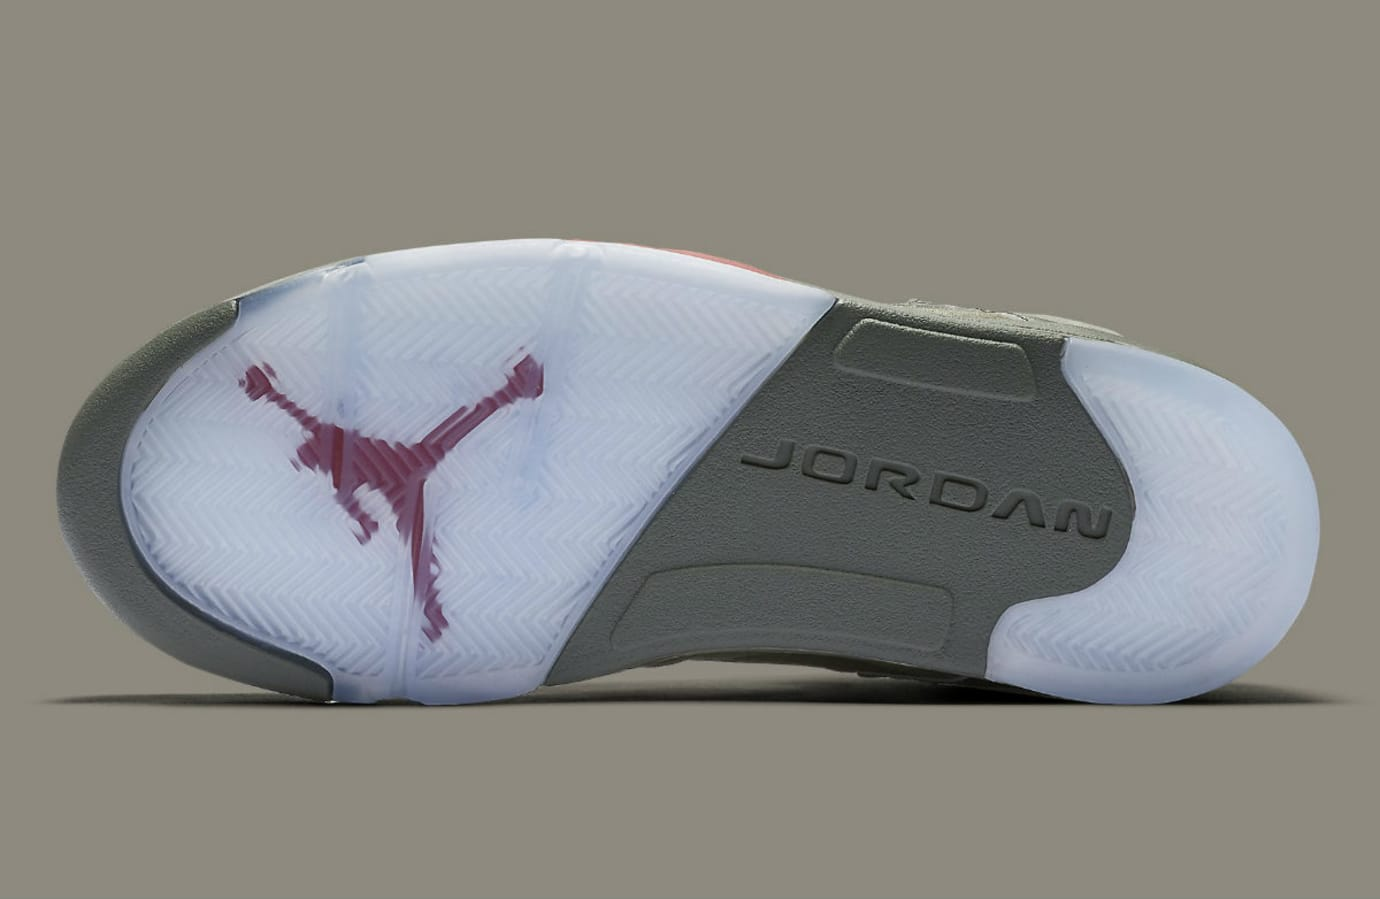 Air Jordan 5 Camo Release Date Sole 136027-051